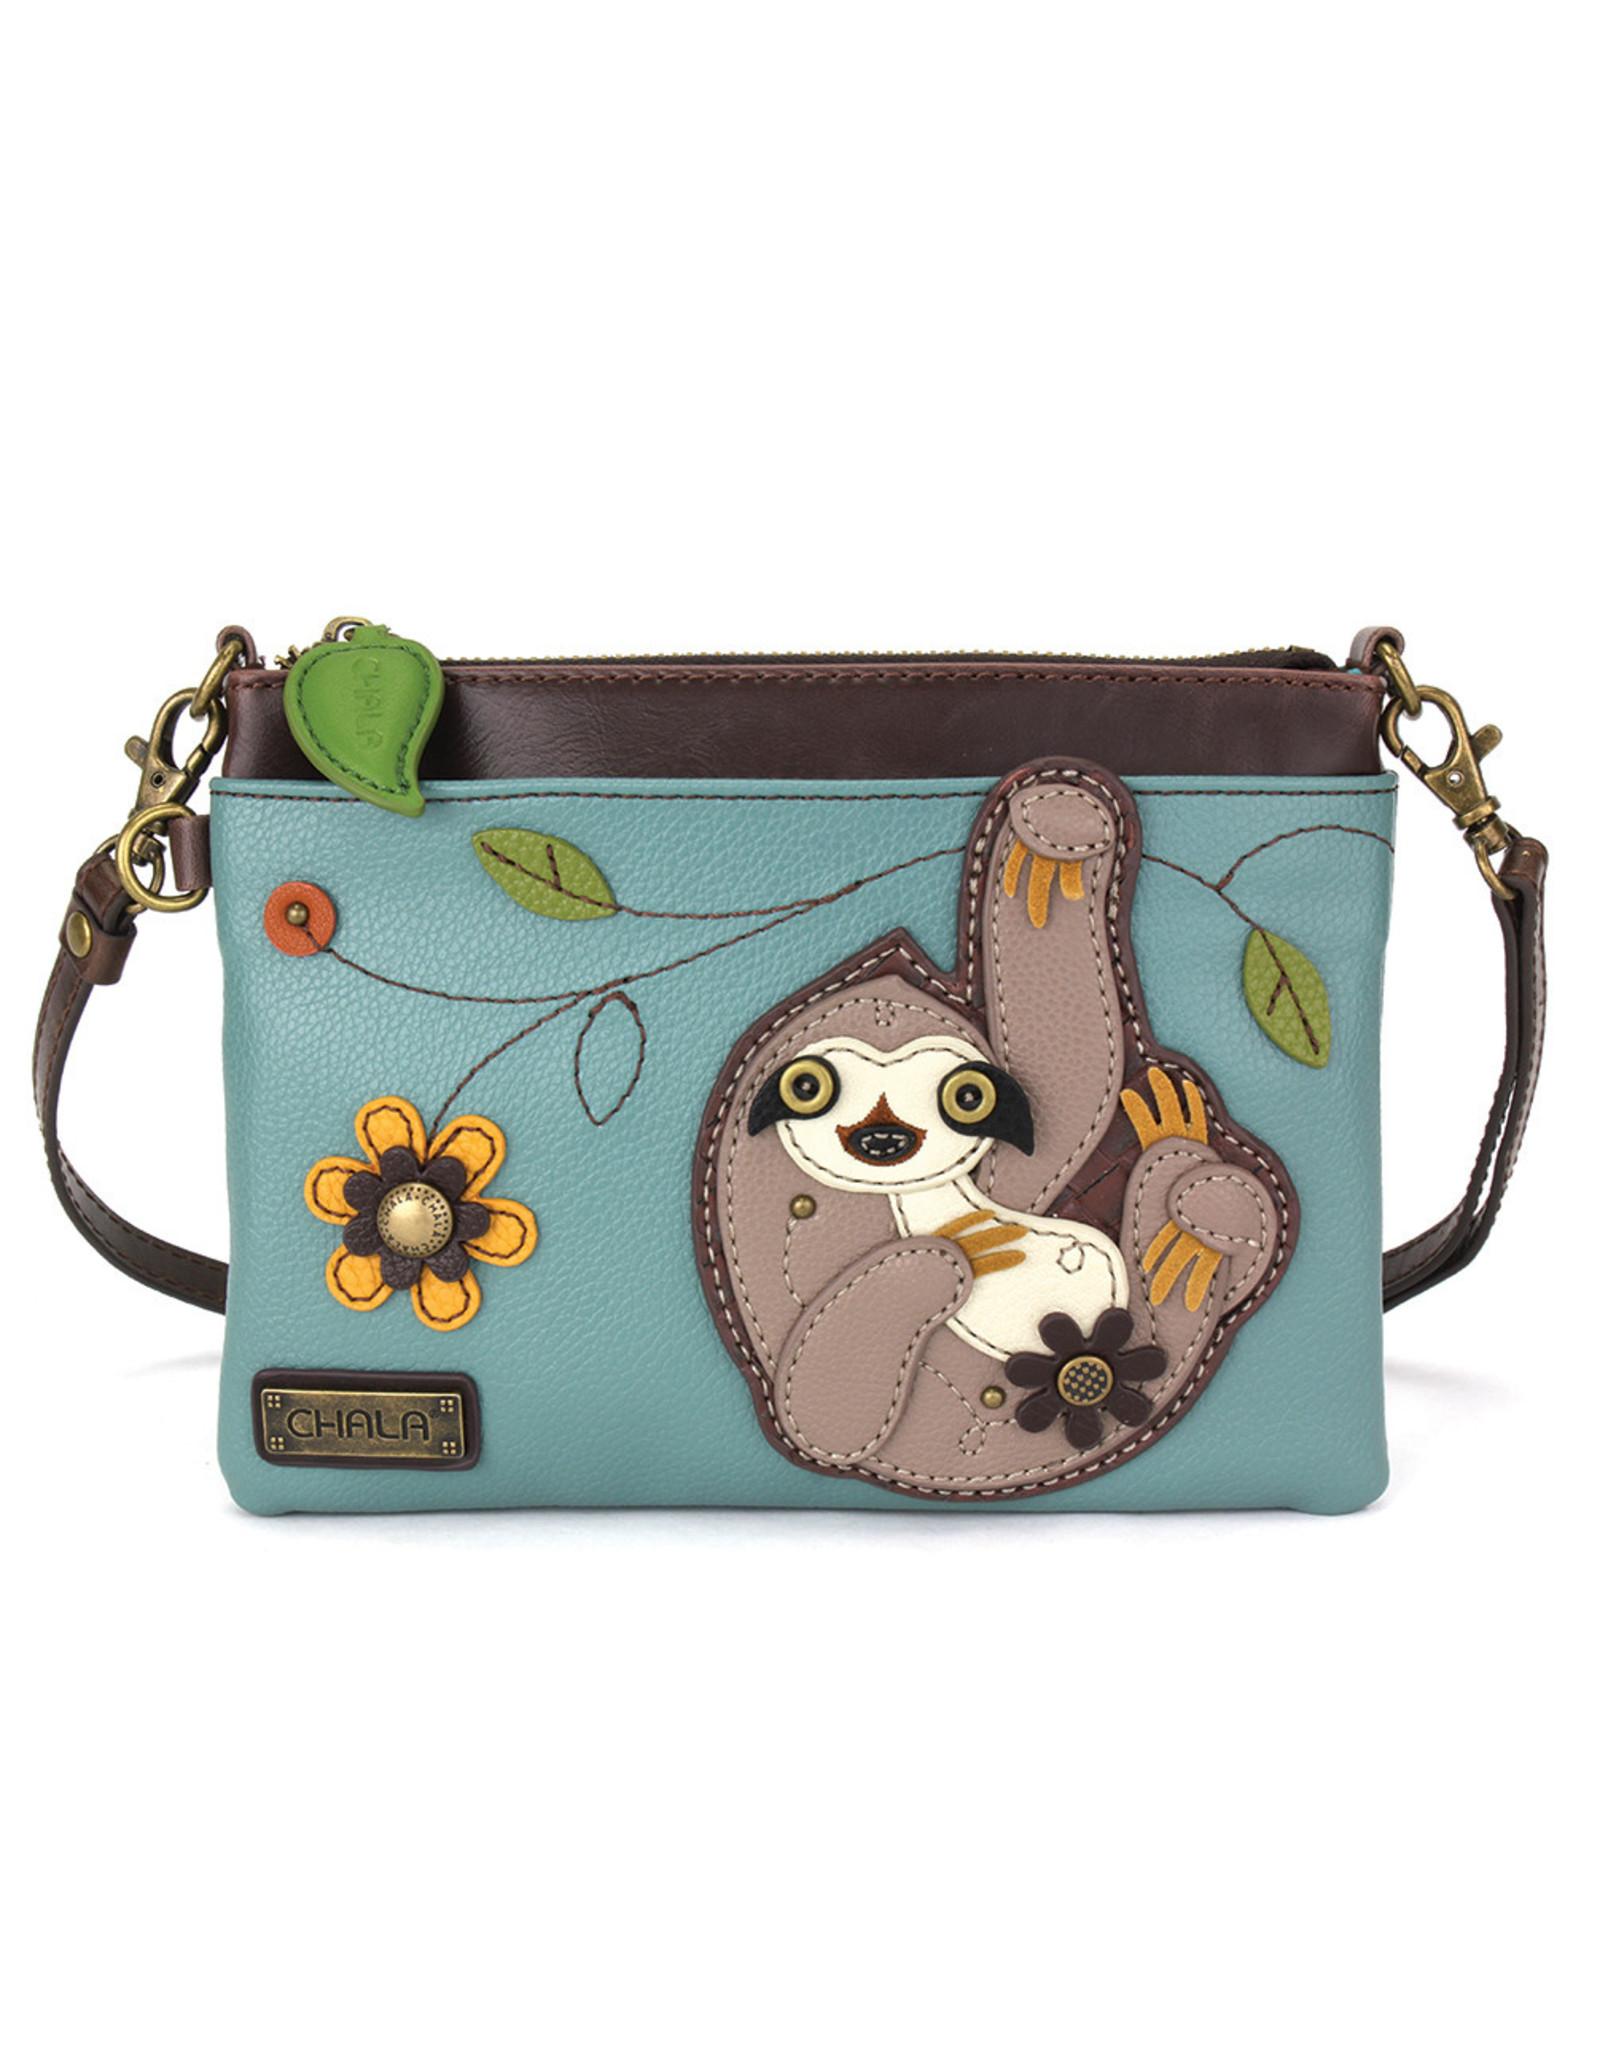 Chala Mini Crossbody - Sloth